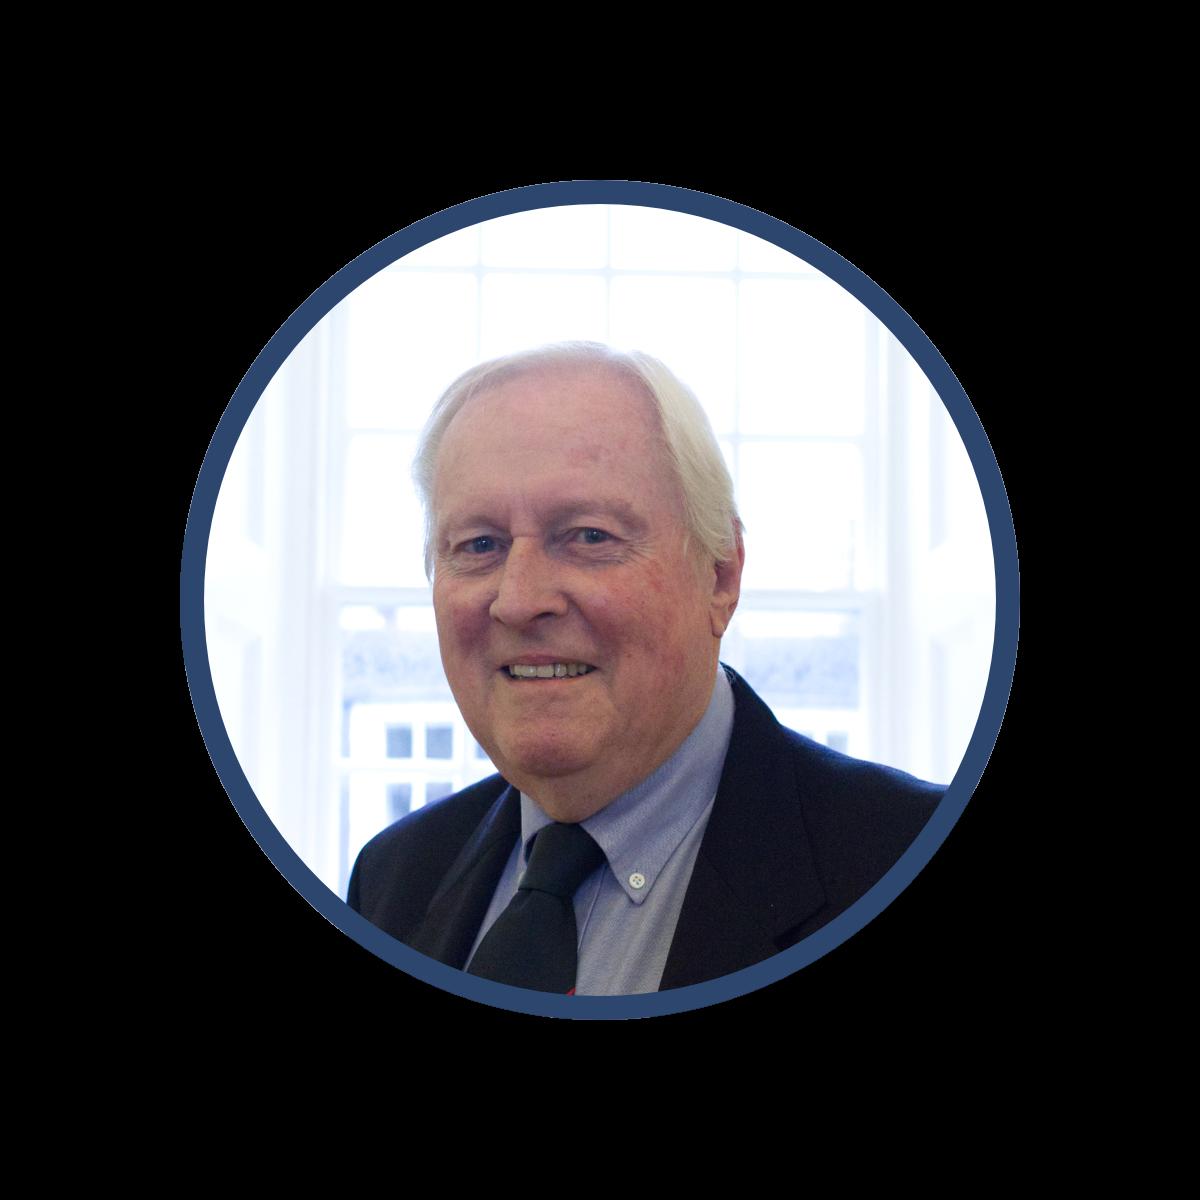 Portrait photo of Councillor John Kirby